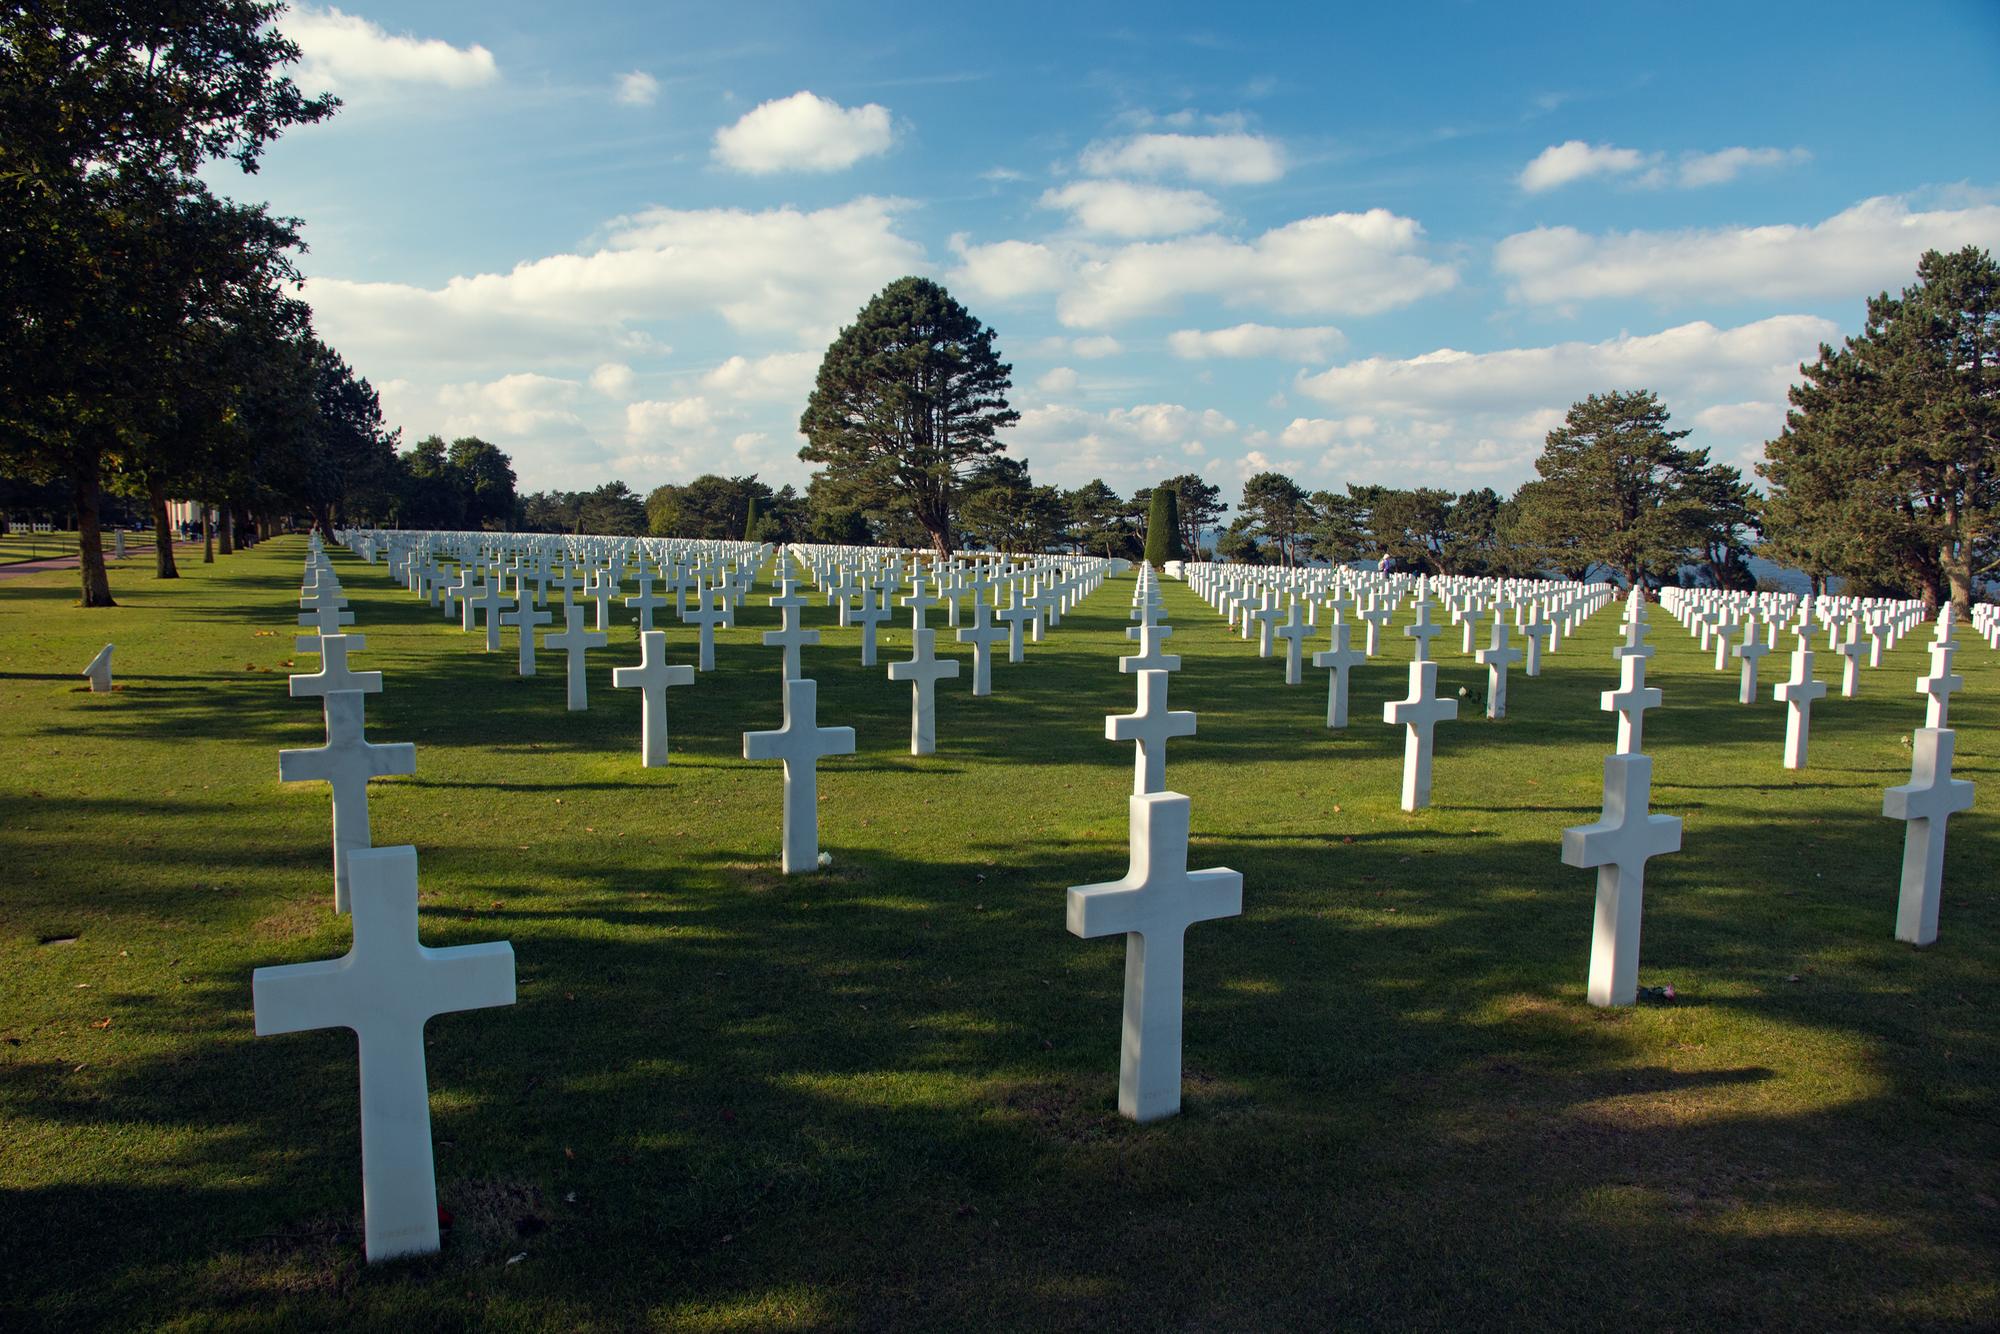 Unnerving symmetry,  American War Cemetery at   Colleville-sur-Mer, France.